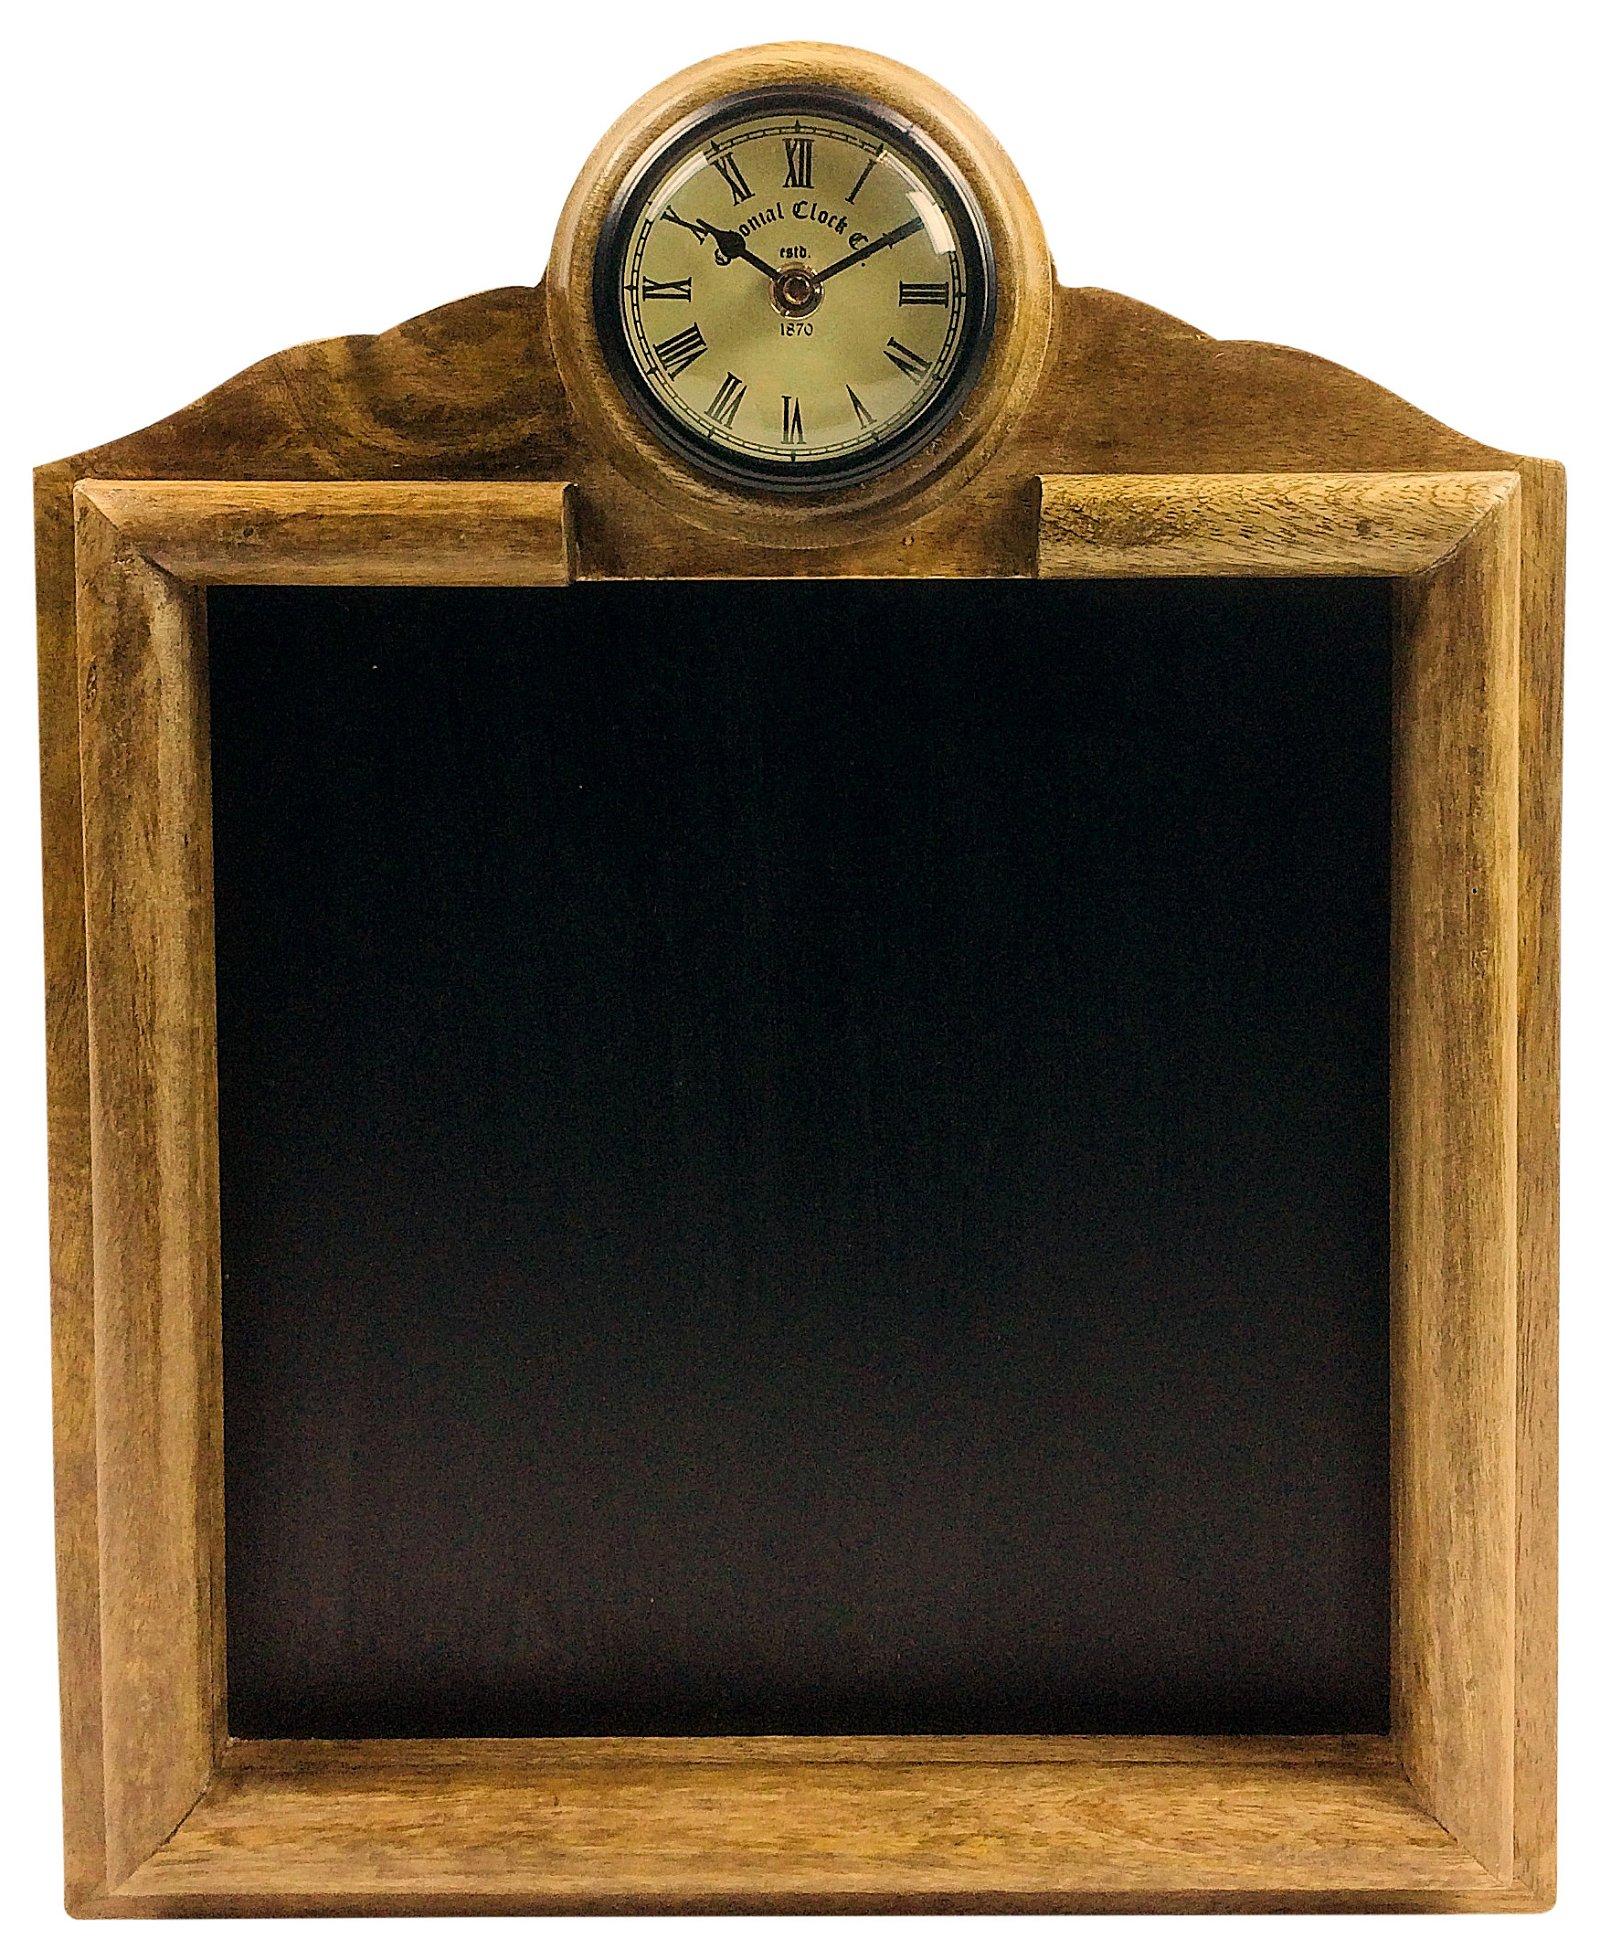 Wooden Blackboard With Clock